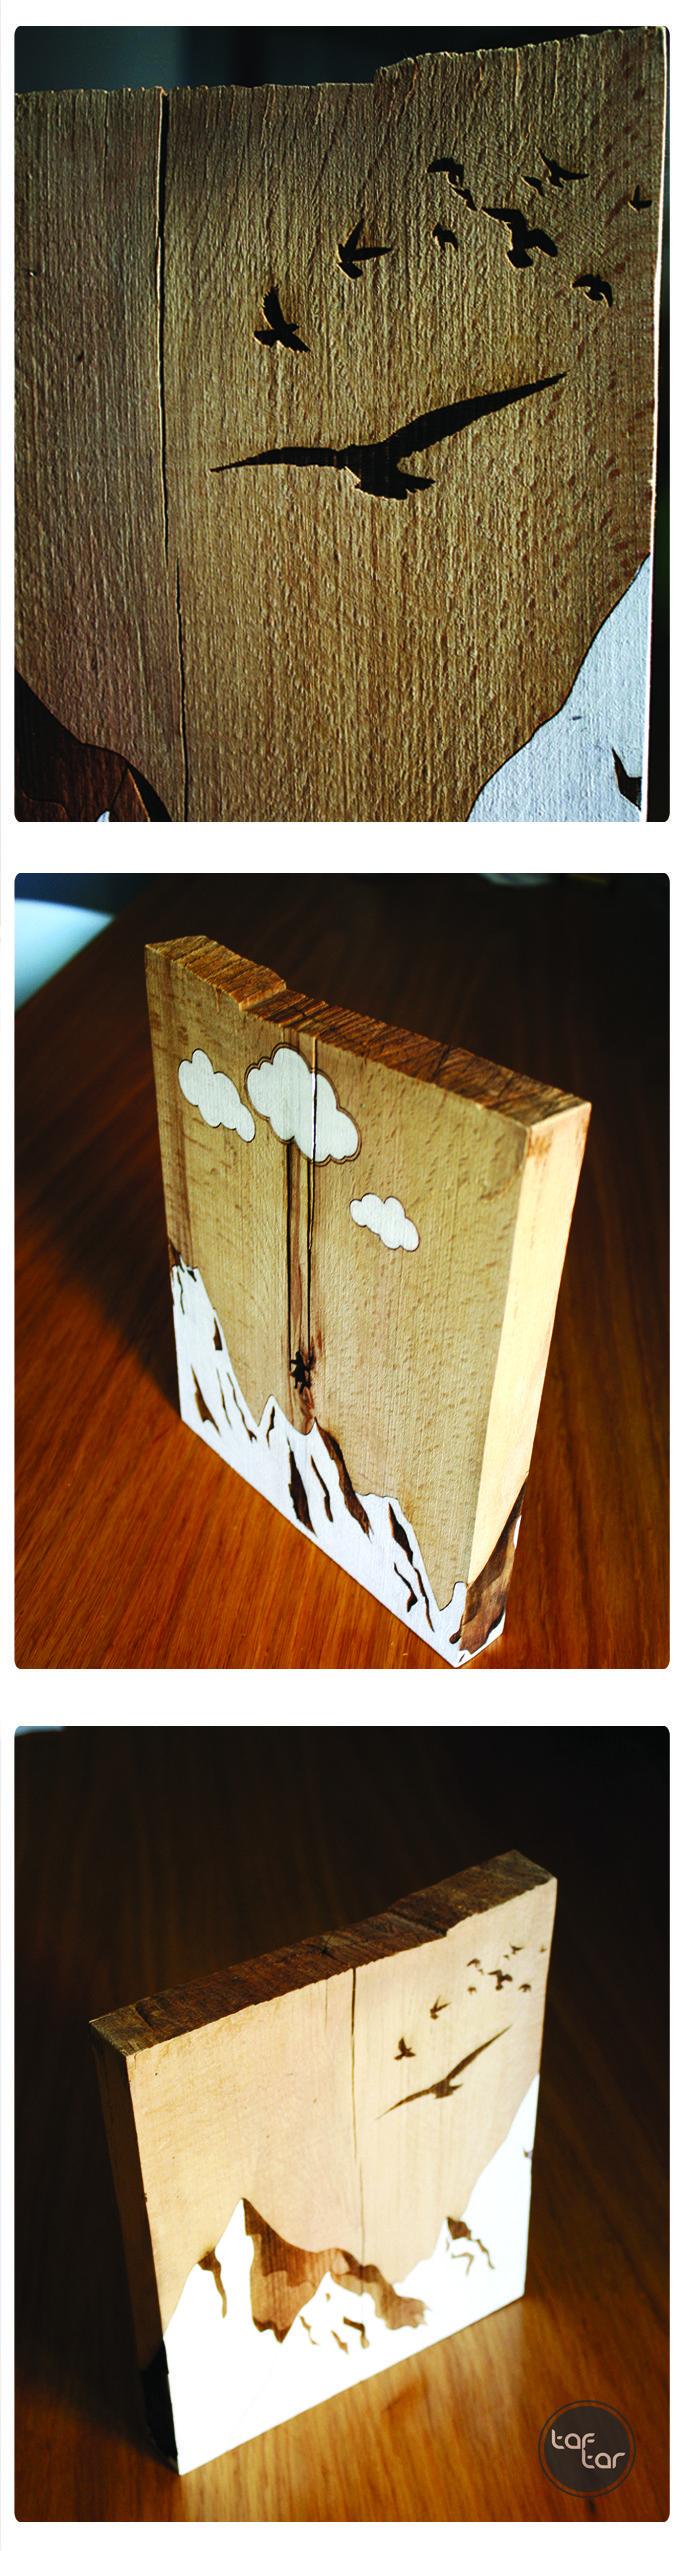 / Laser engraved and hand-painted   piece of wood. //  / Κομμάτι ξύλου χαραγμένο σε laser και βαμμένο στο χέρι. //